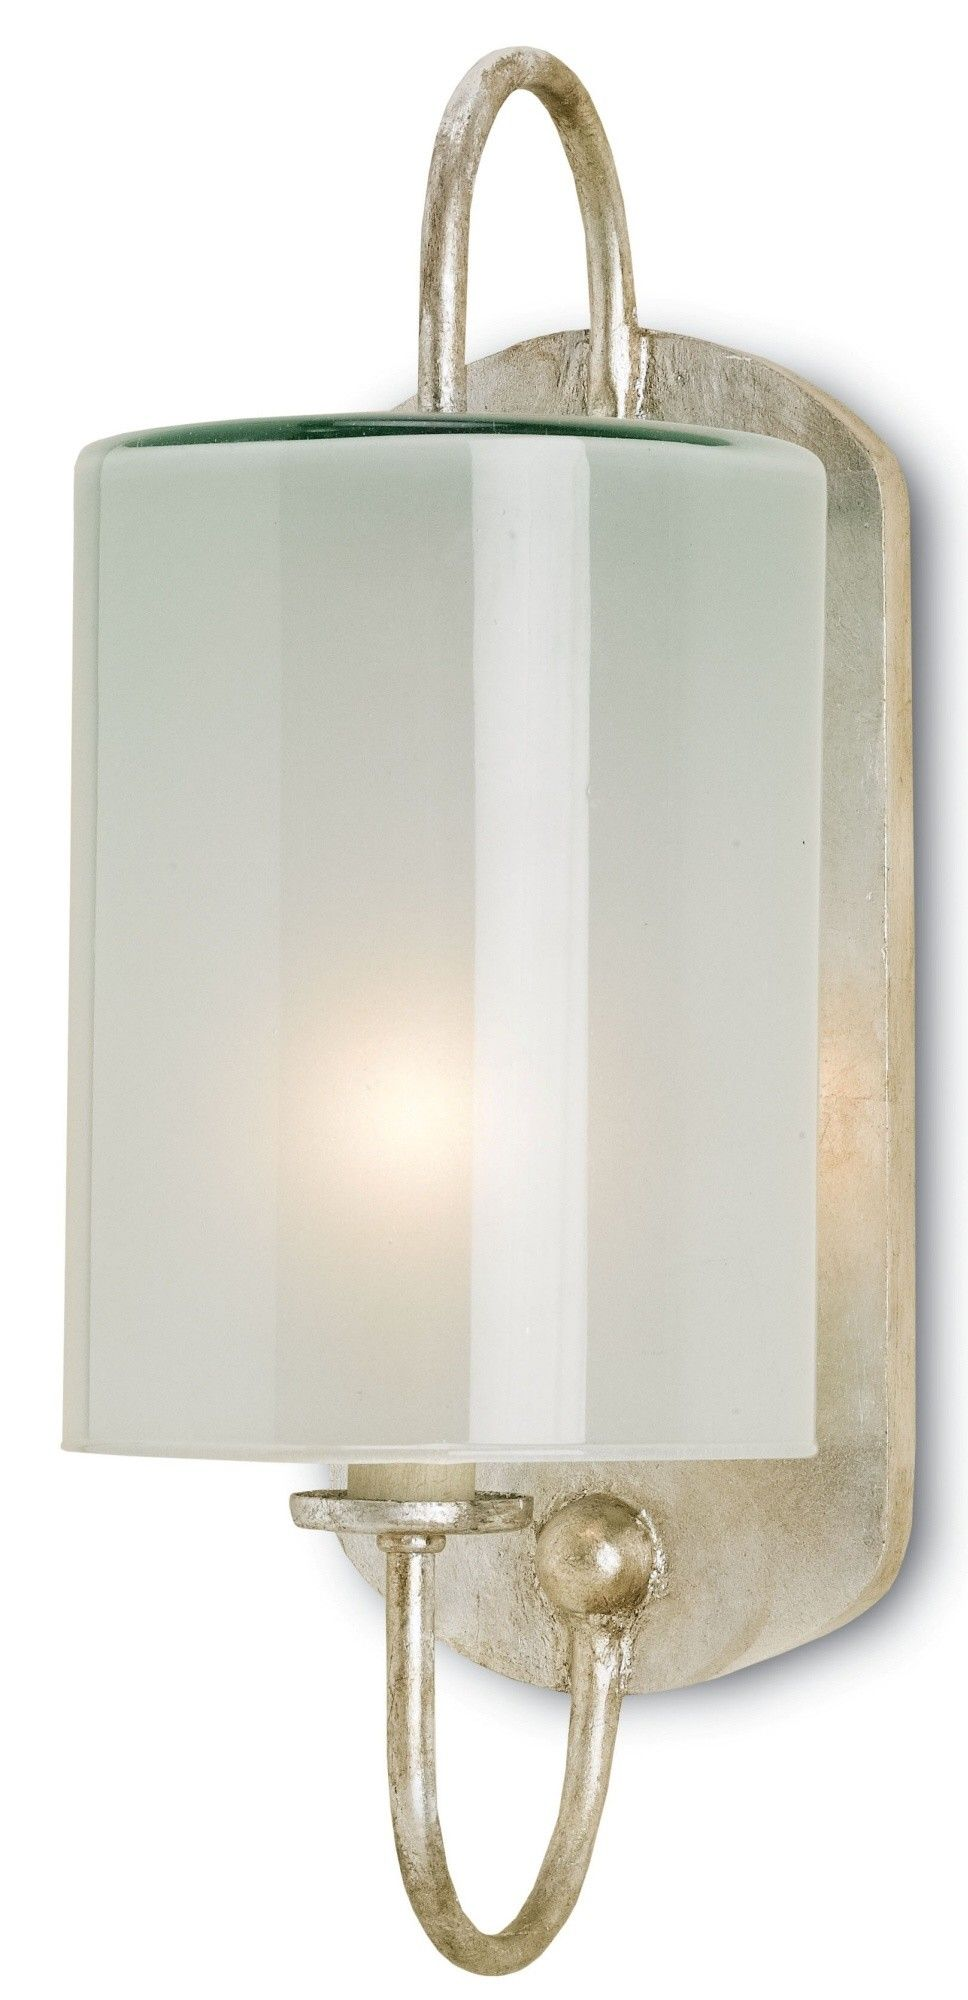 led sconce bathroom marielle ie en wall lights chrome light